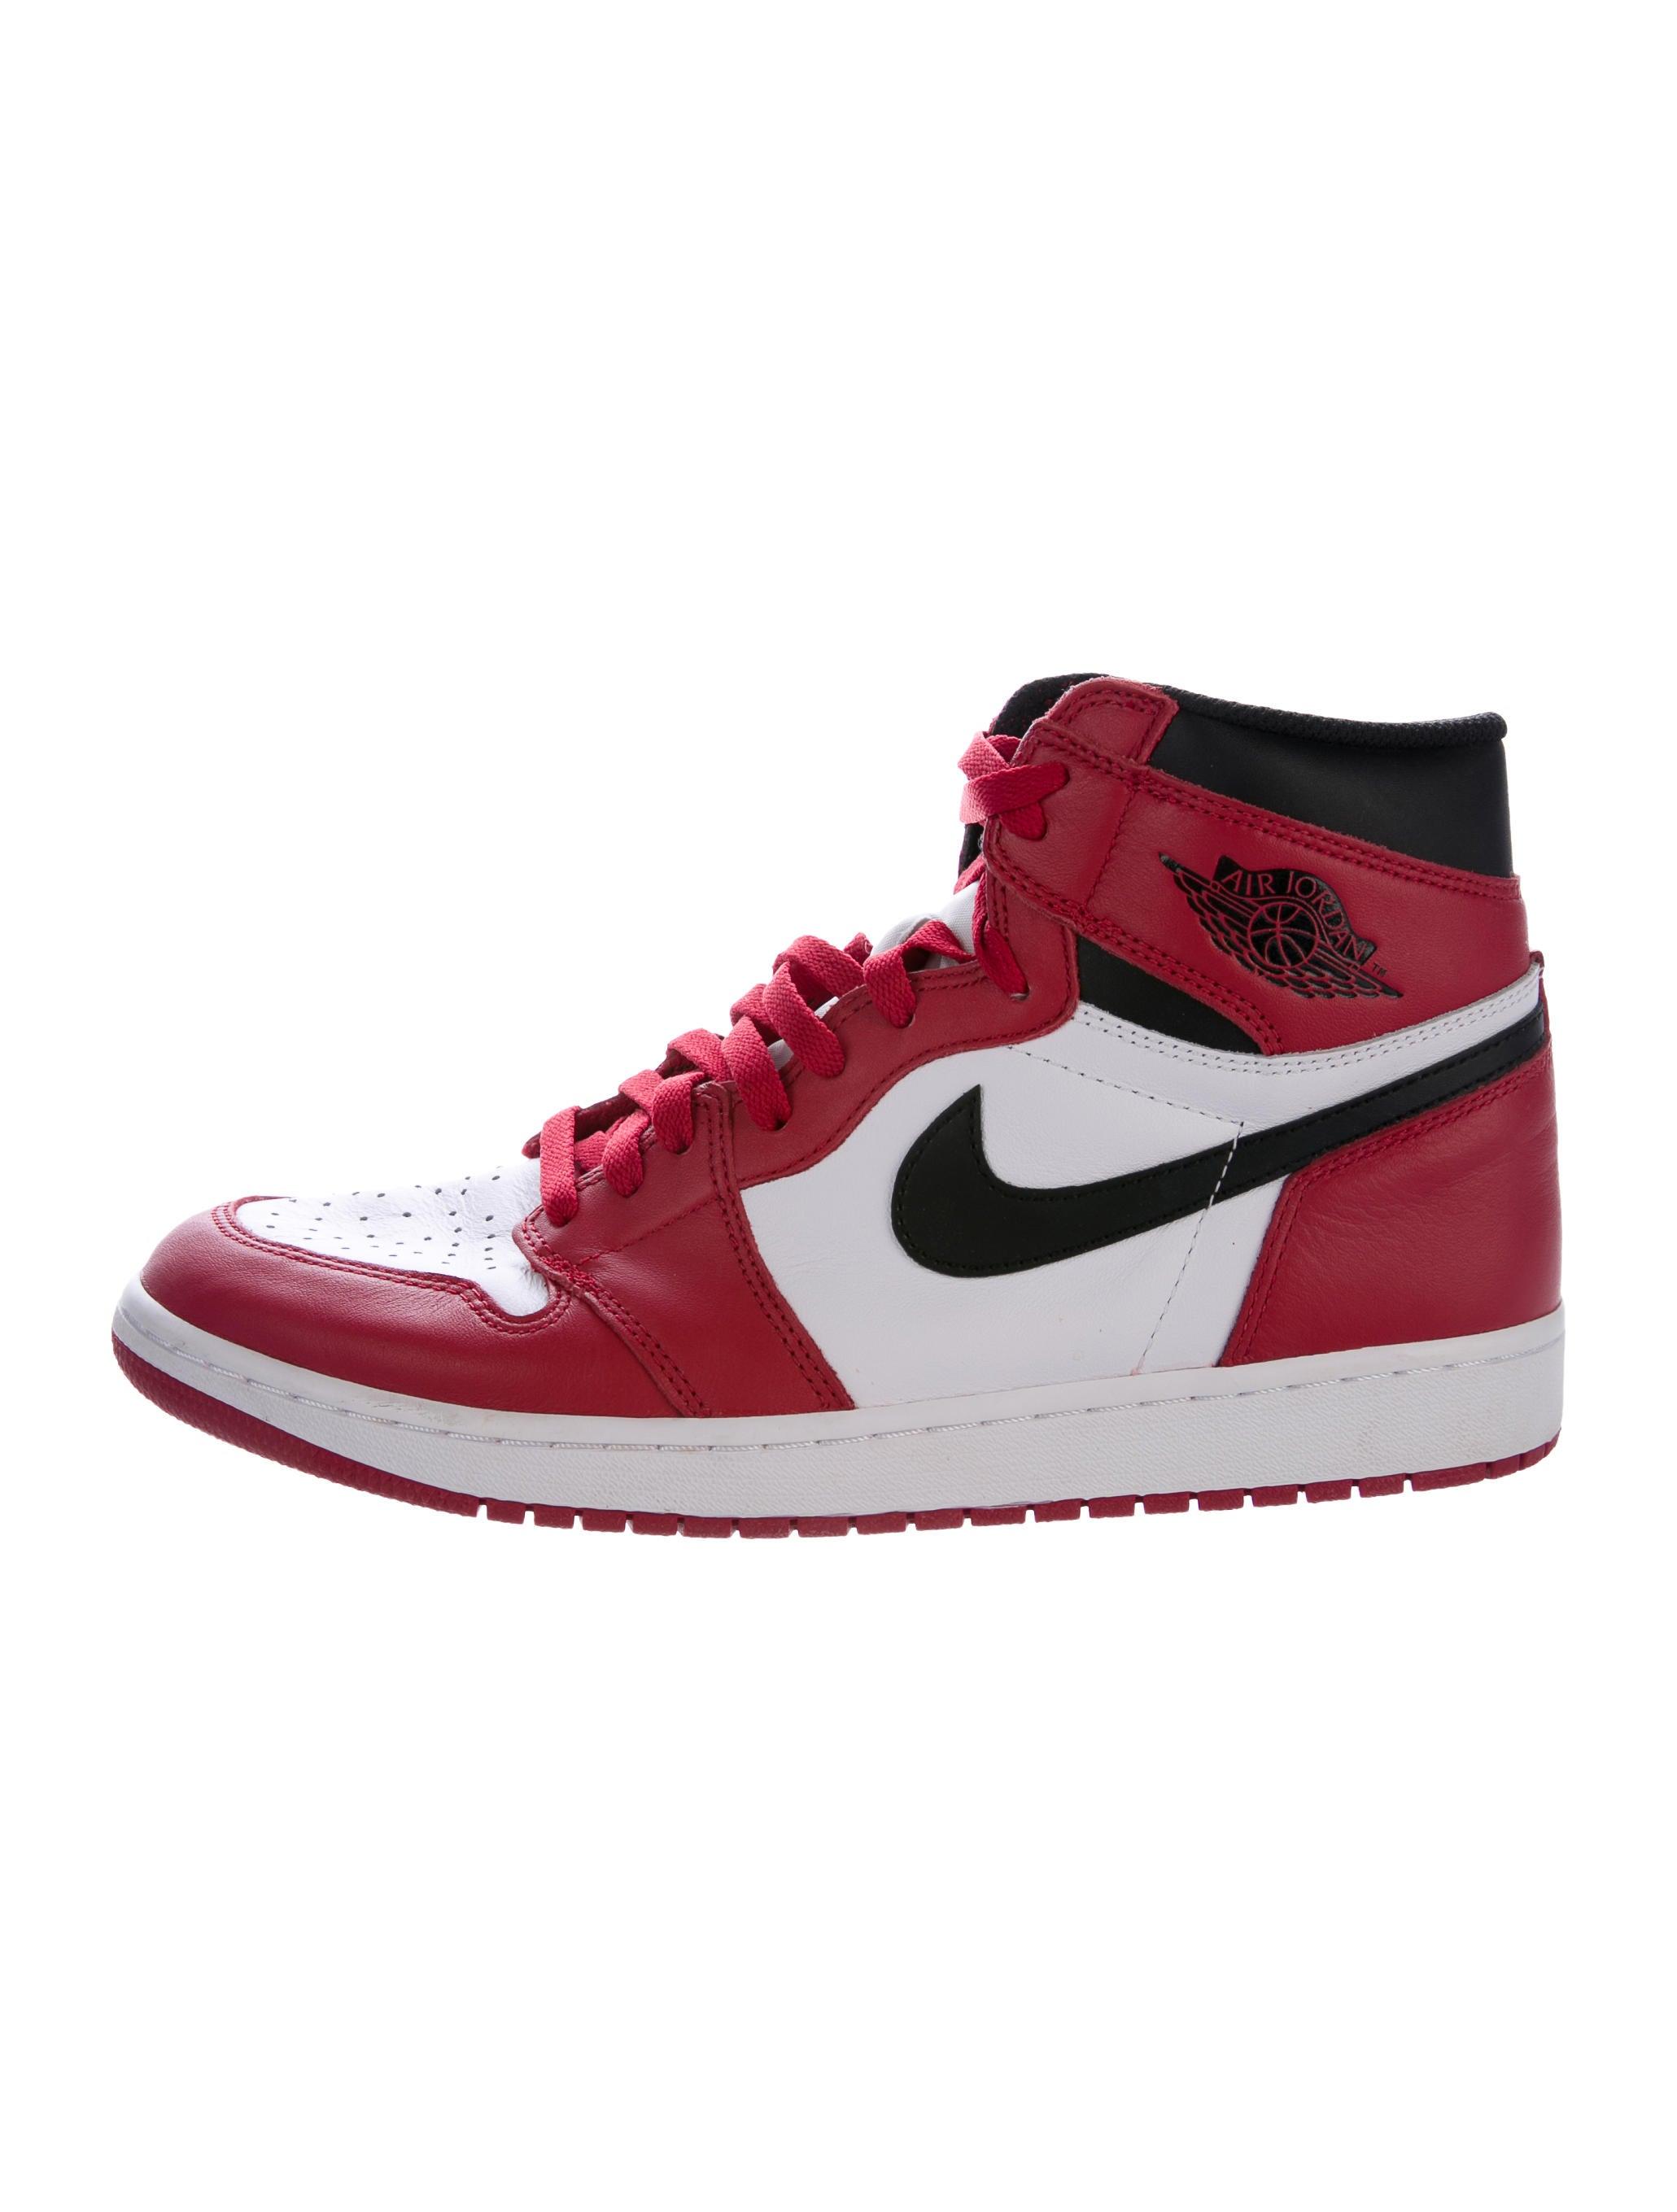 Decorative Nike Shoes